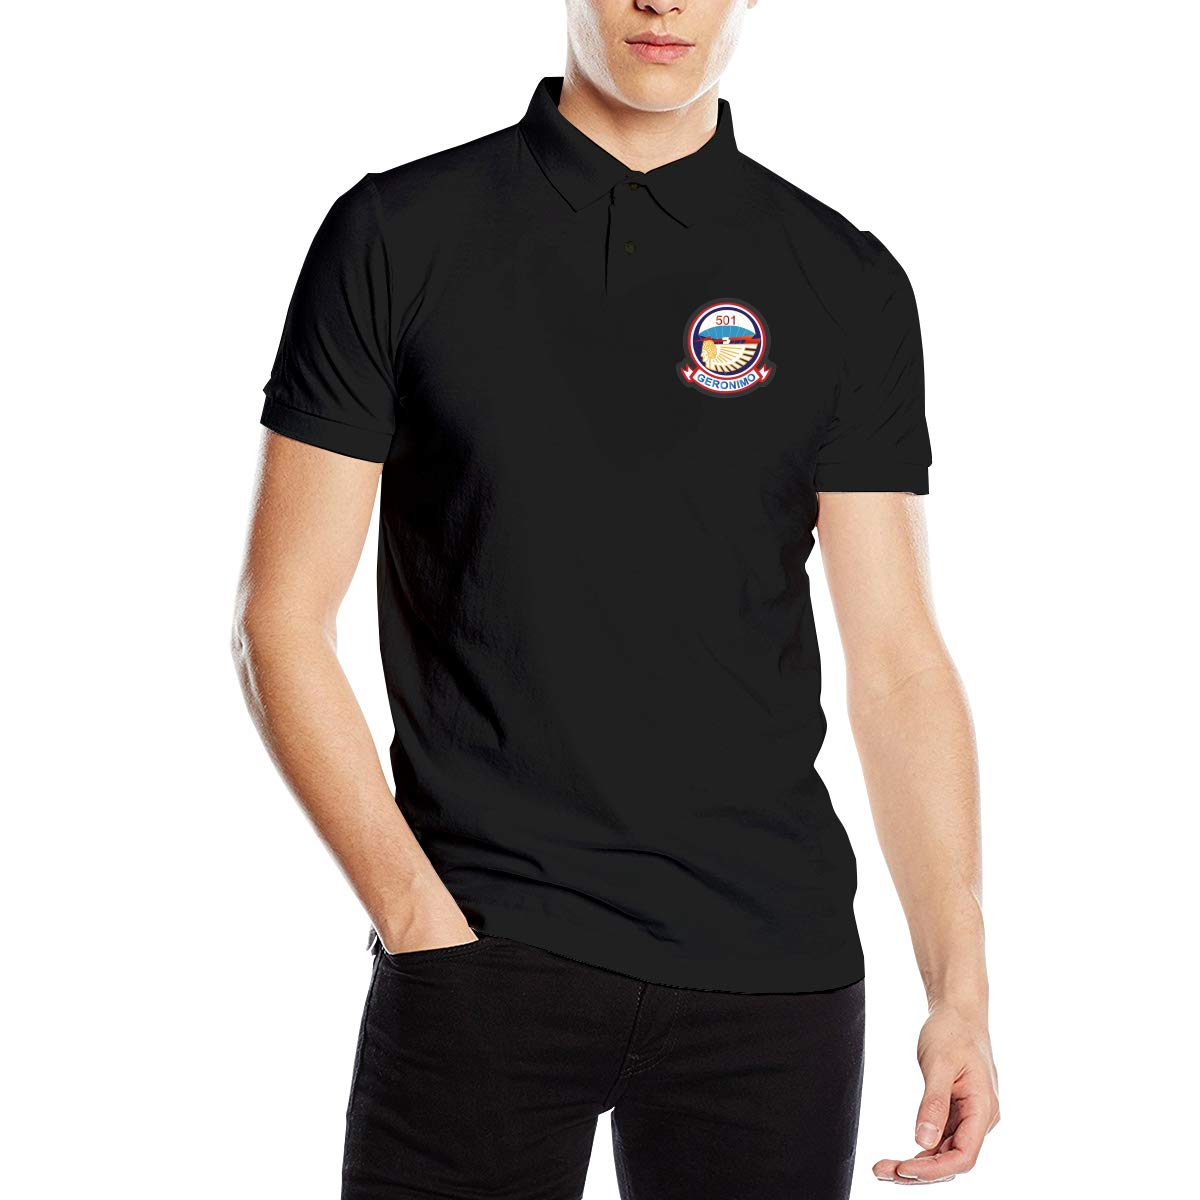 501 Parachute Infantry Regiment Mens Regular-Fit Cotton Polo Shirt Short Sleeve